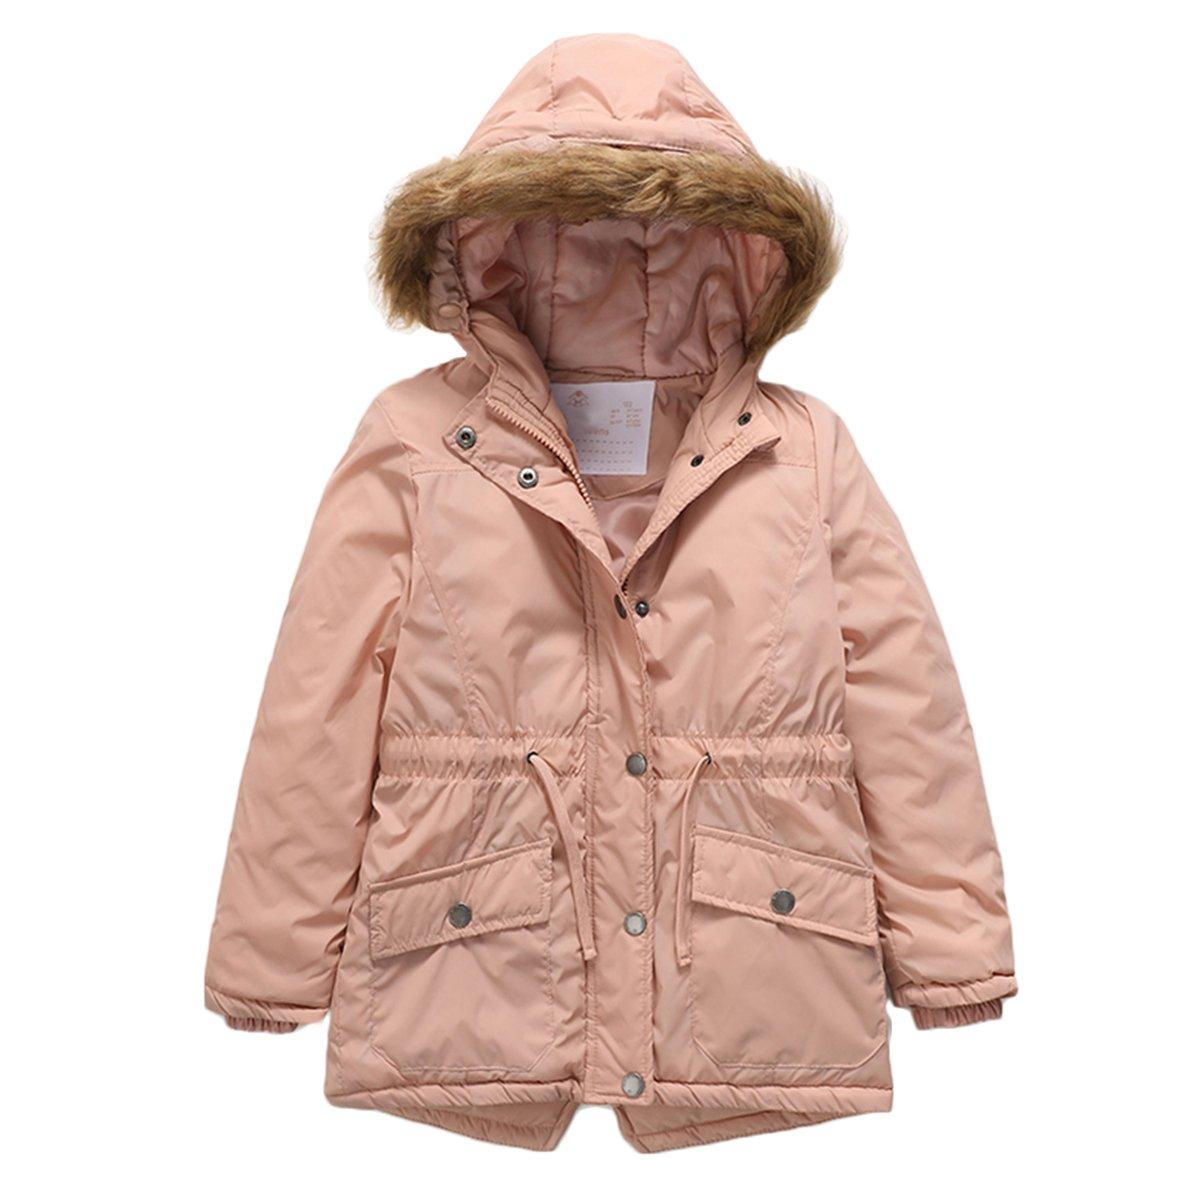 PHIBEE Girls' Cotton Winter Windproof Faux Fur Hooded Parka Jacket Kangya